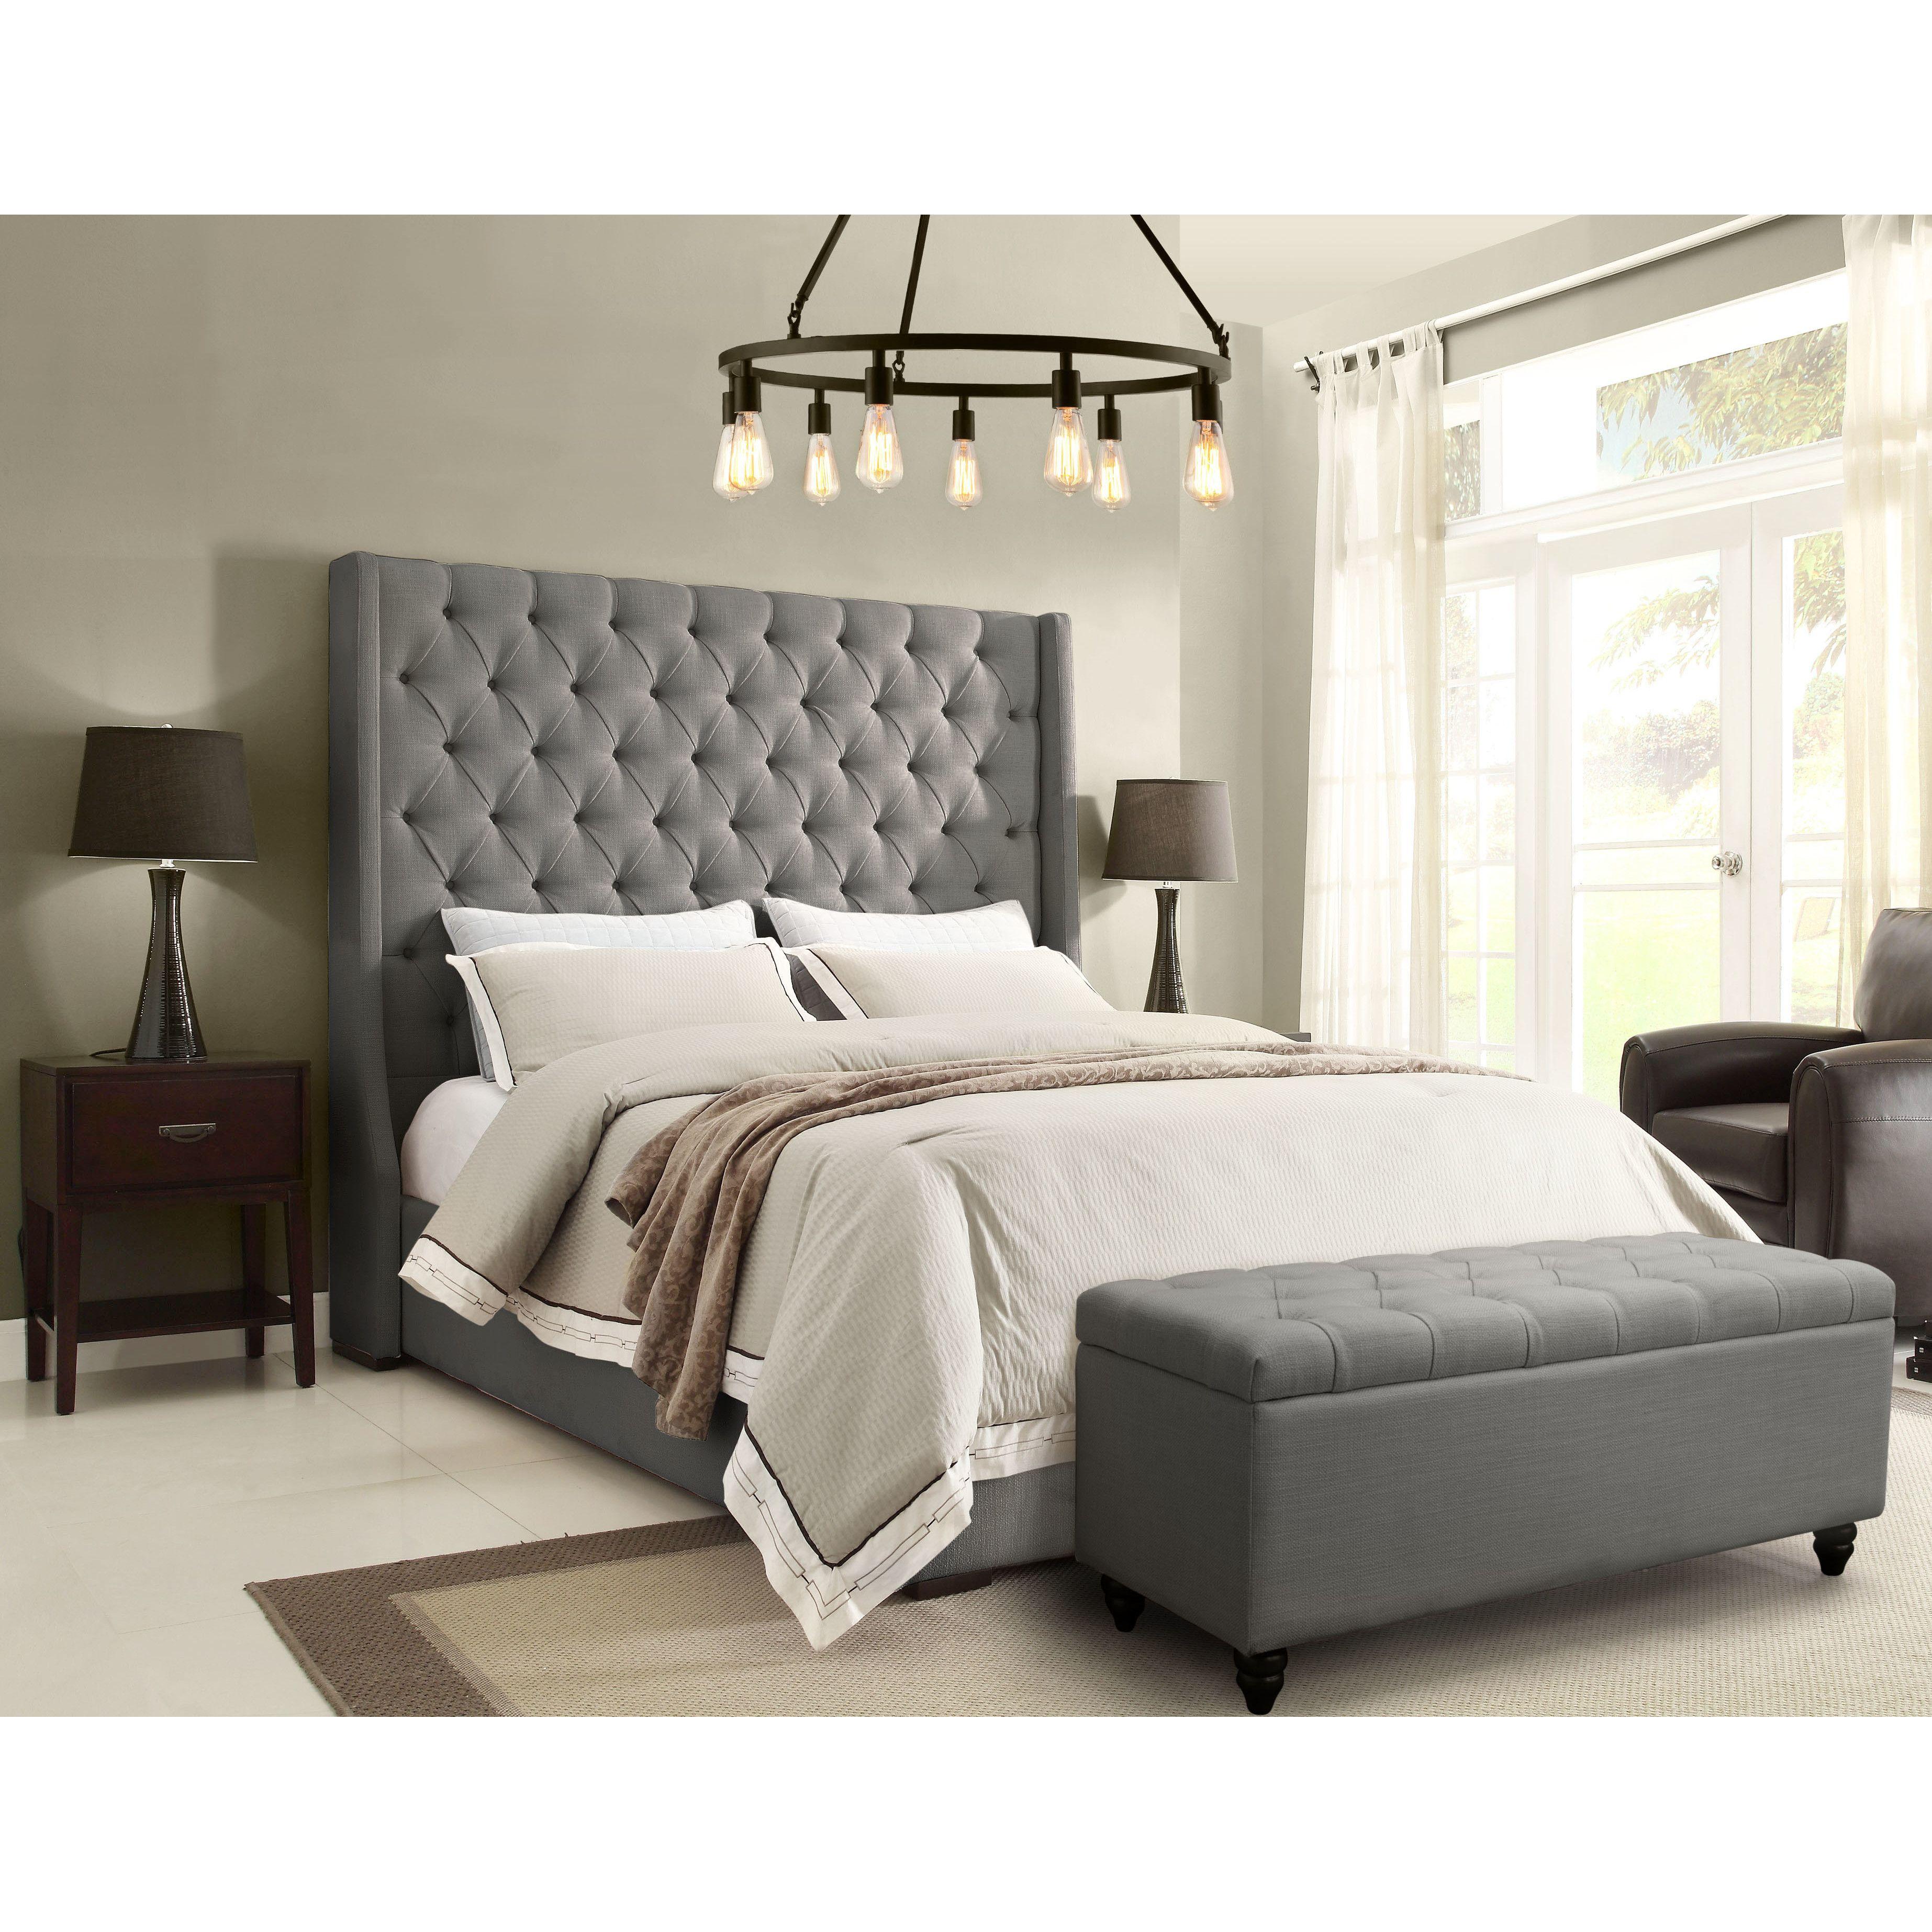 Diamond Sofa Park Avenue Upholstered Platform Bed   Warehouse Loft ...